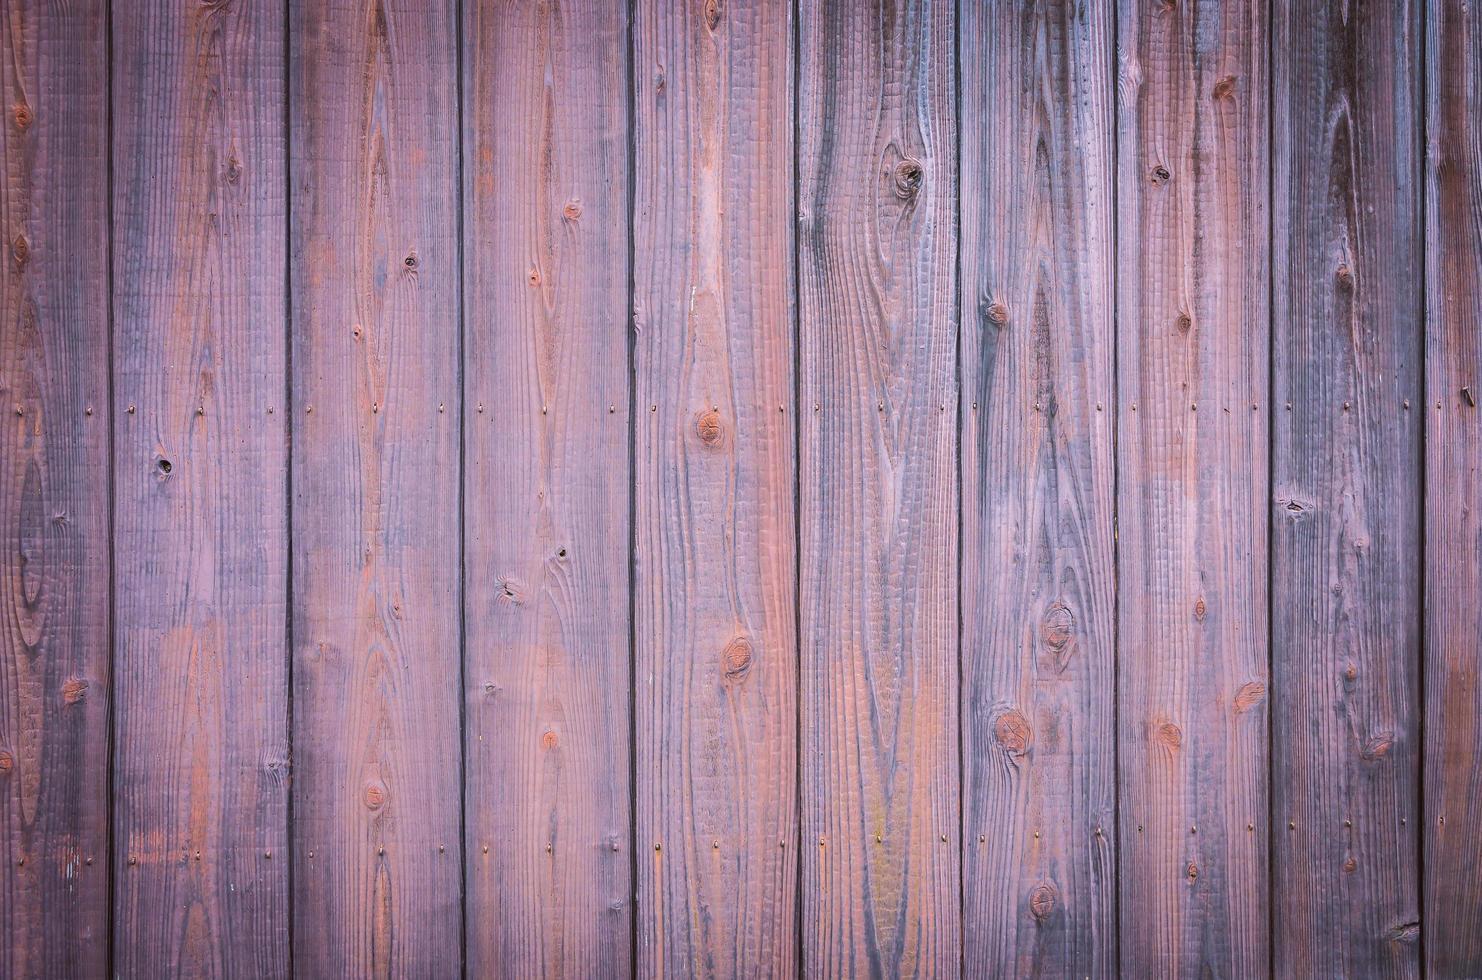 oud hout texturen achtergrond foto